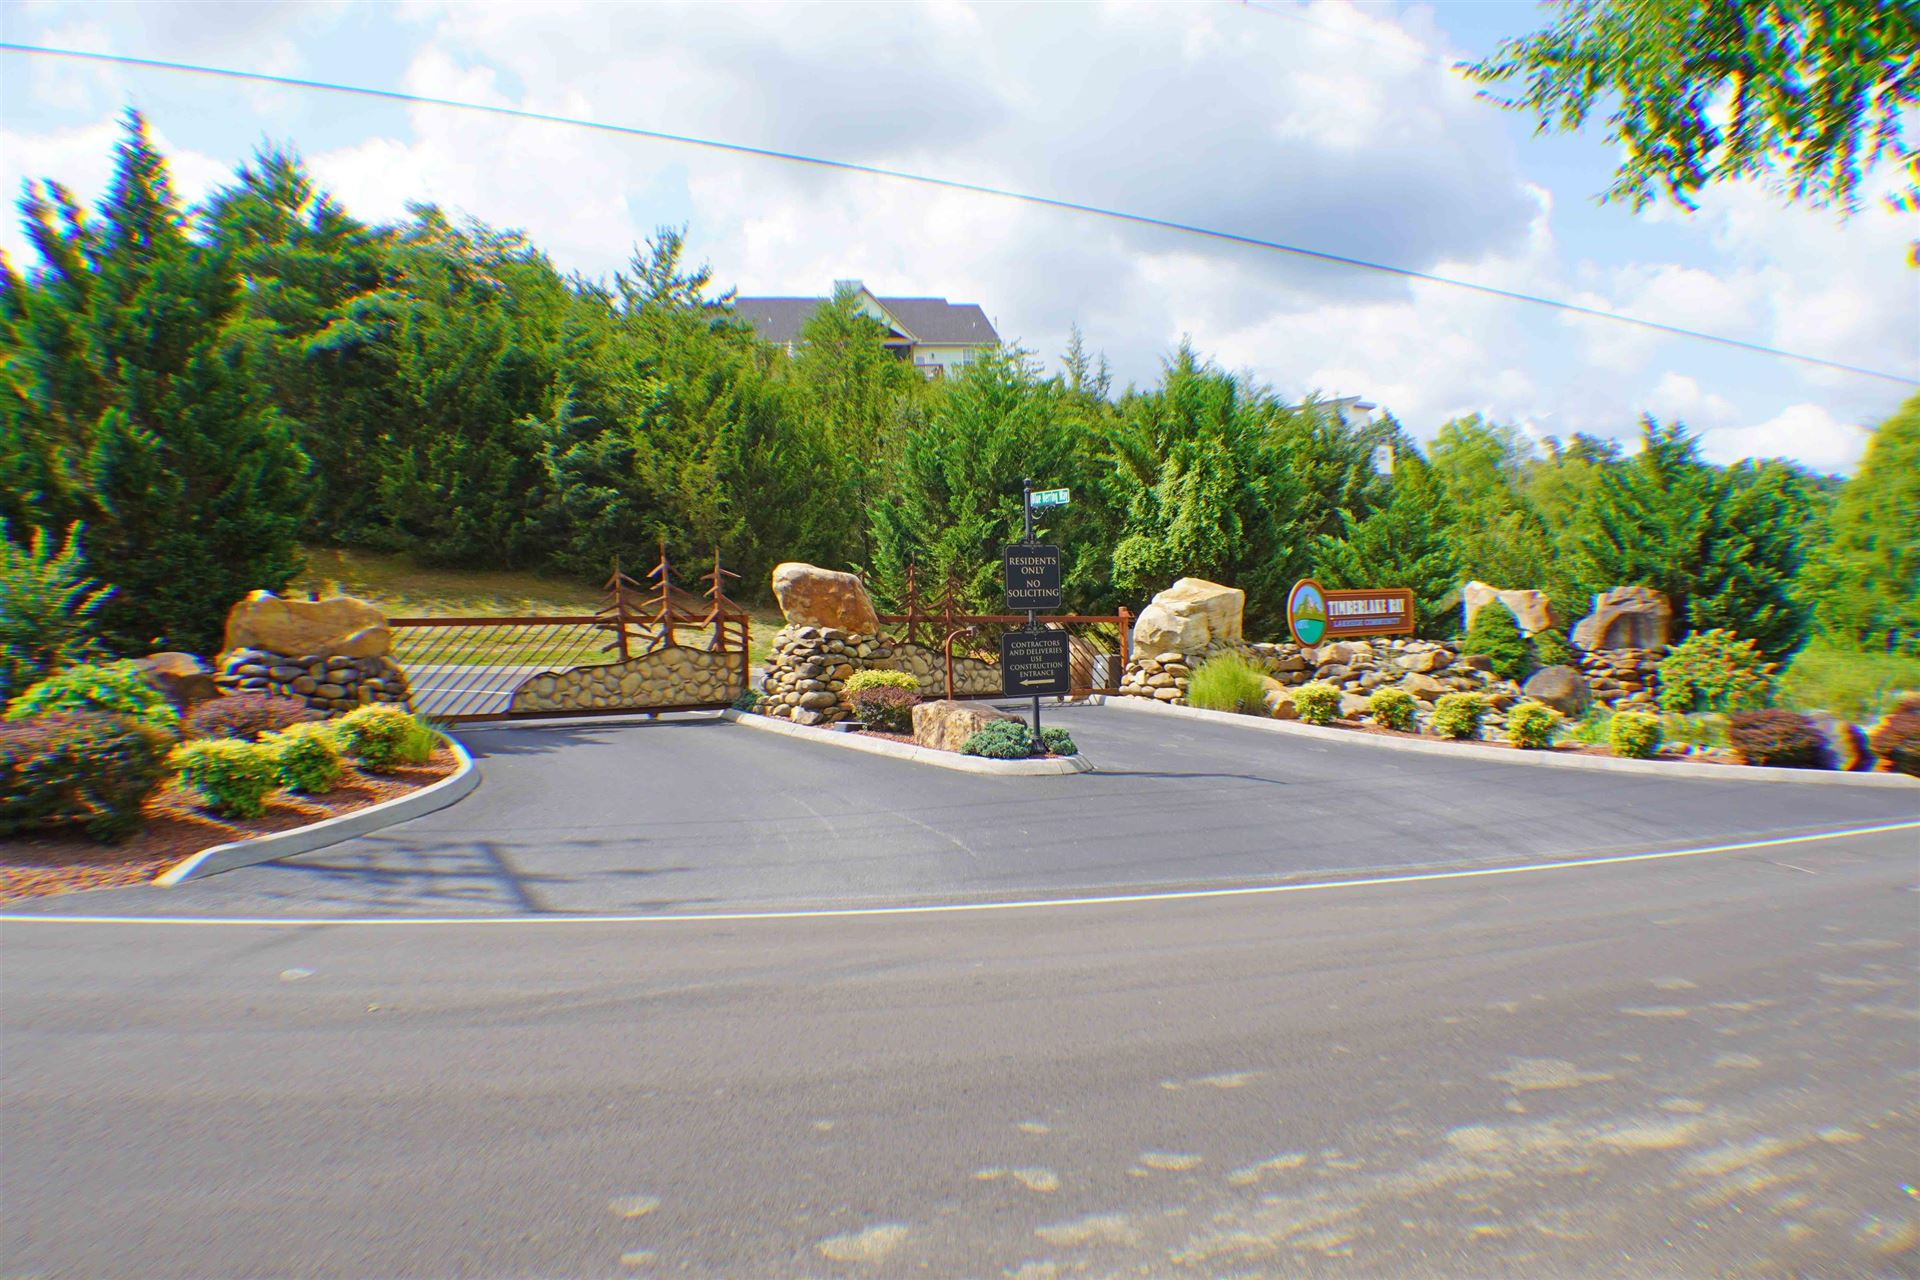 Photo of 841 Blue Herring Way, Sevierville, TN 37876 (MLS # 1160495)